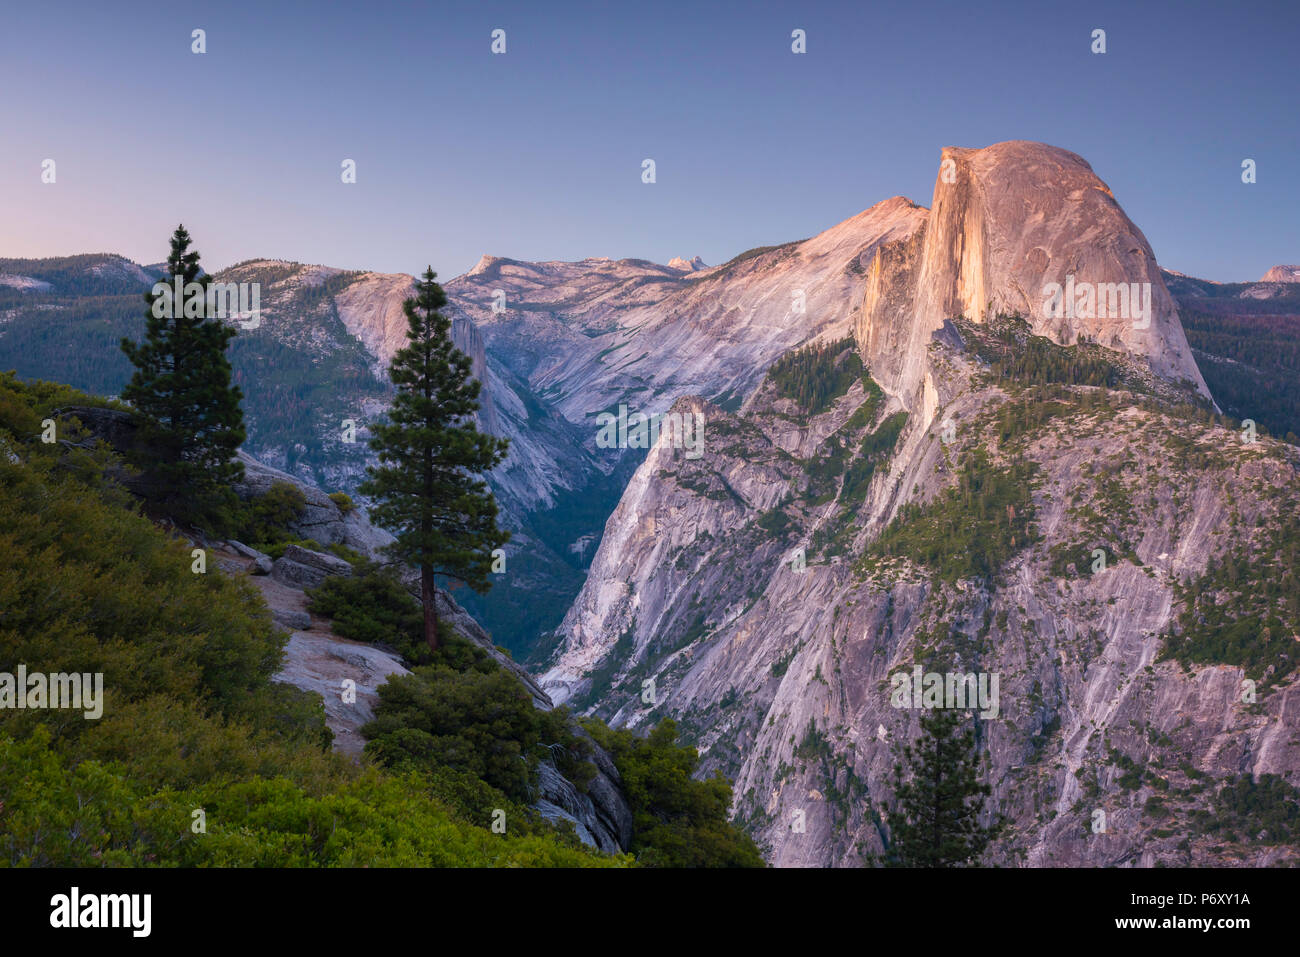 USA, California, Yosemite National Park, Half Dome - Stock Image